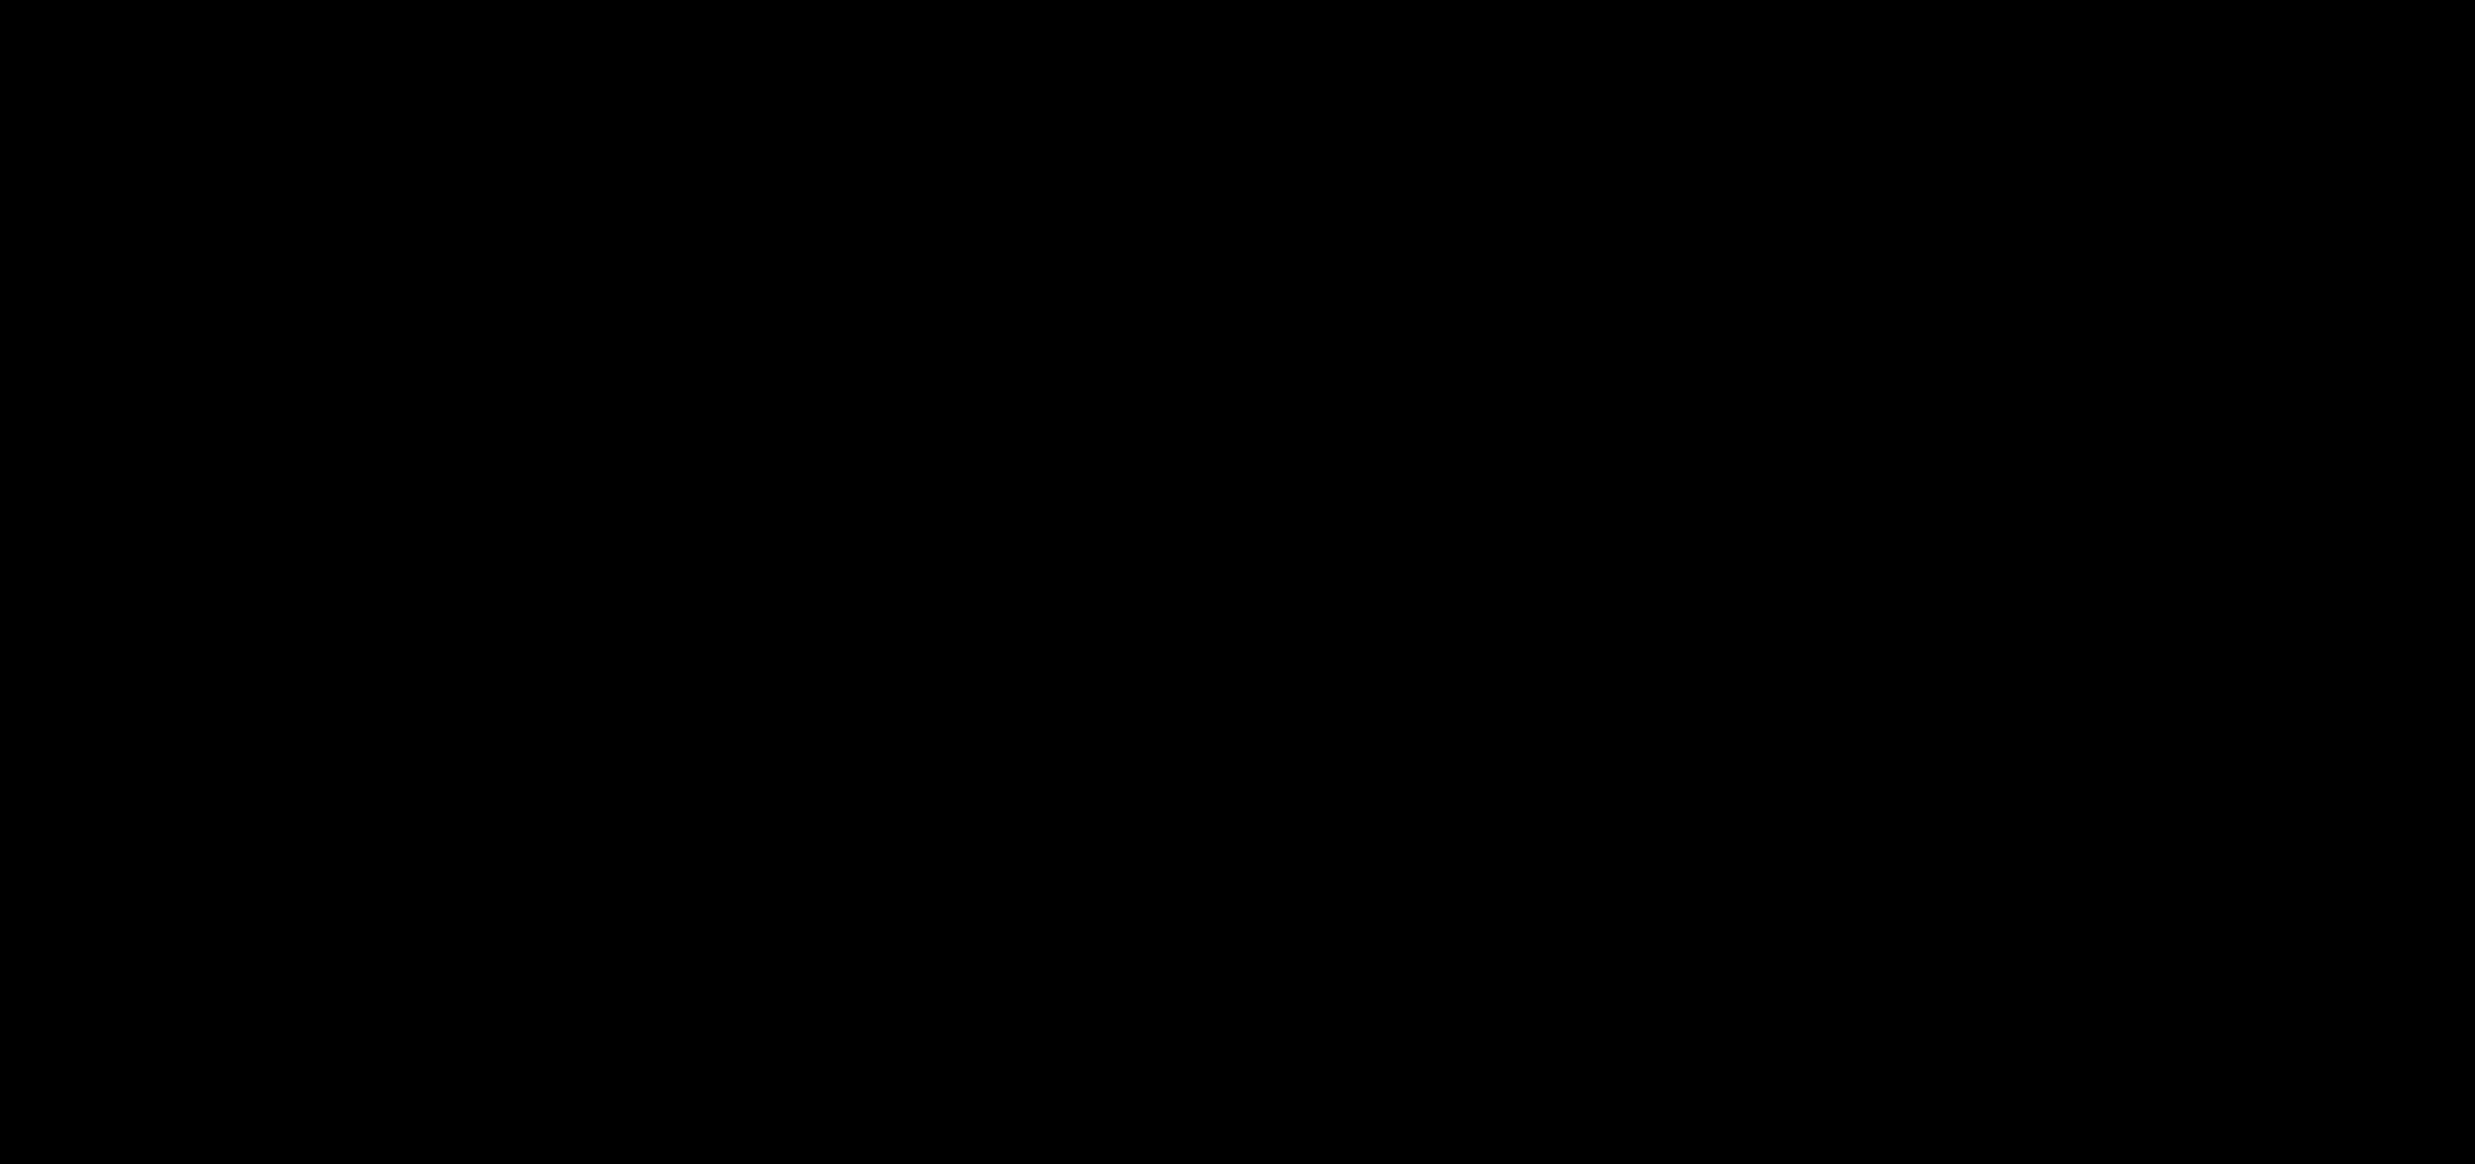 Deinas